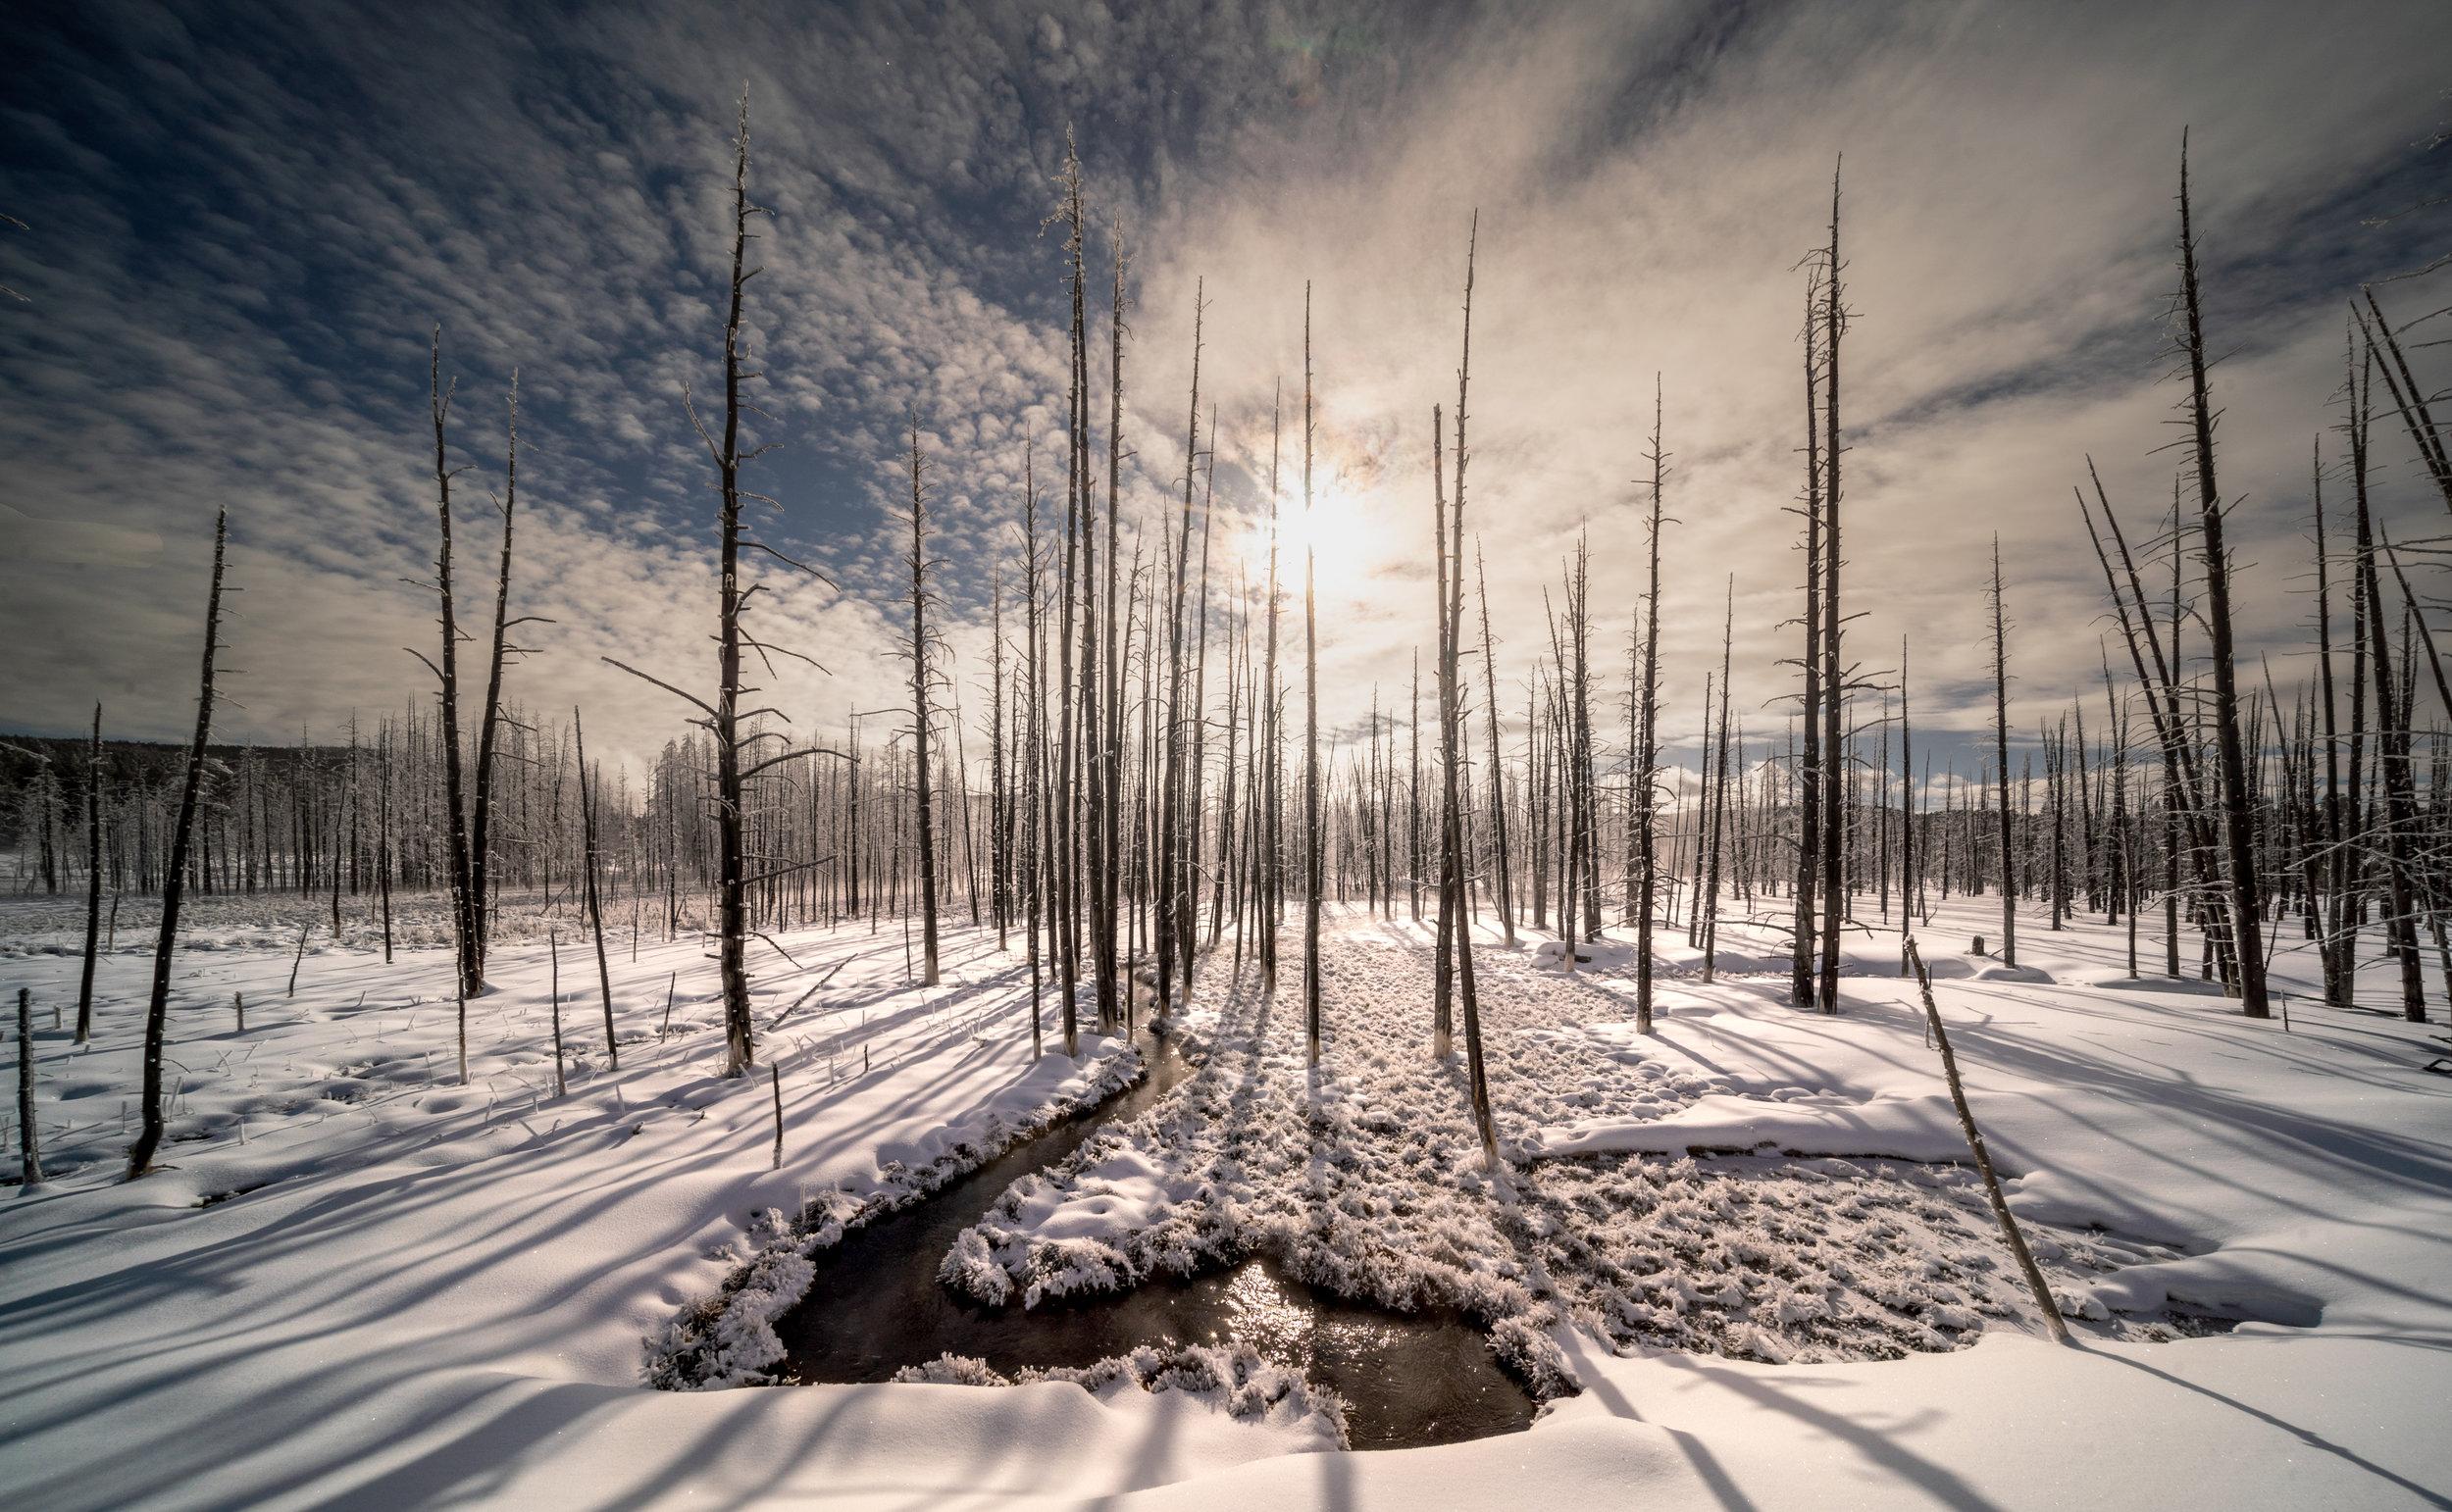 20190302_YellowstoneMckay_T_A08145.jpg